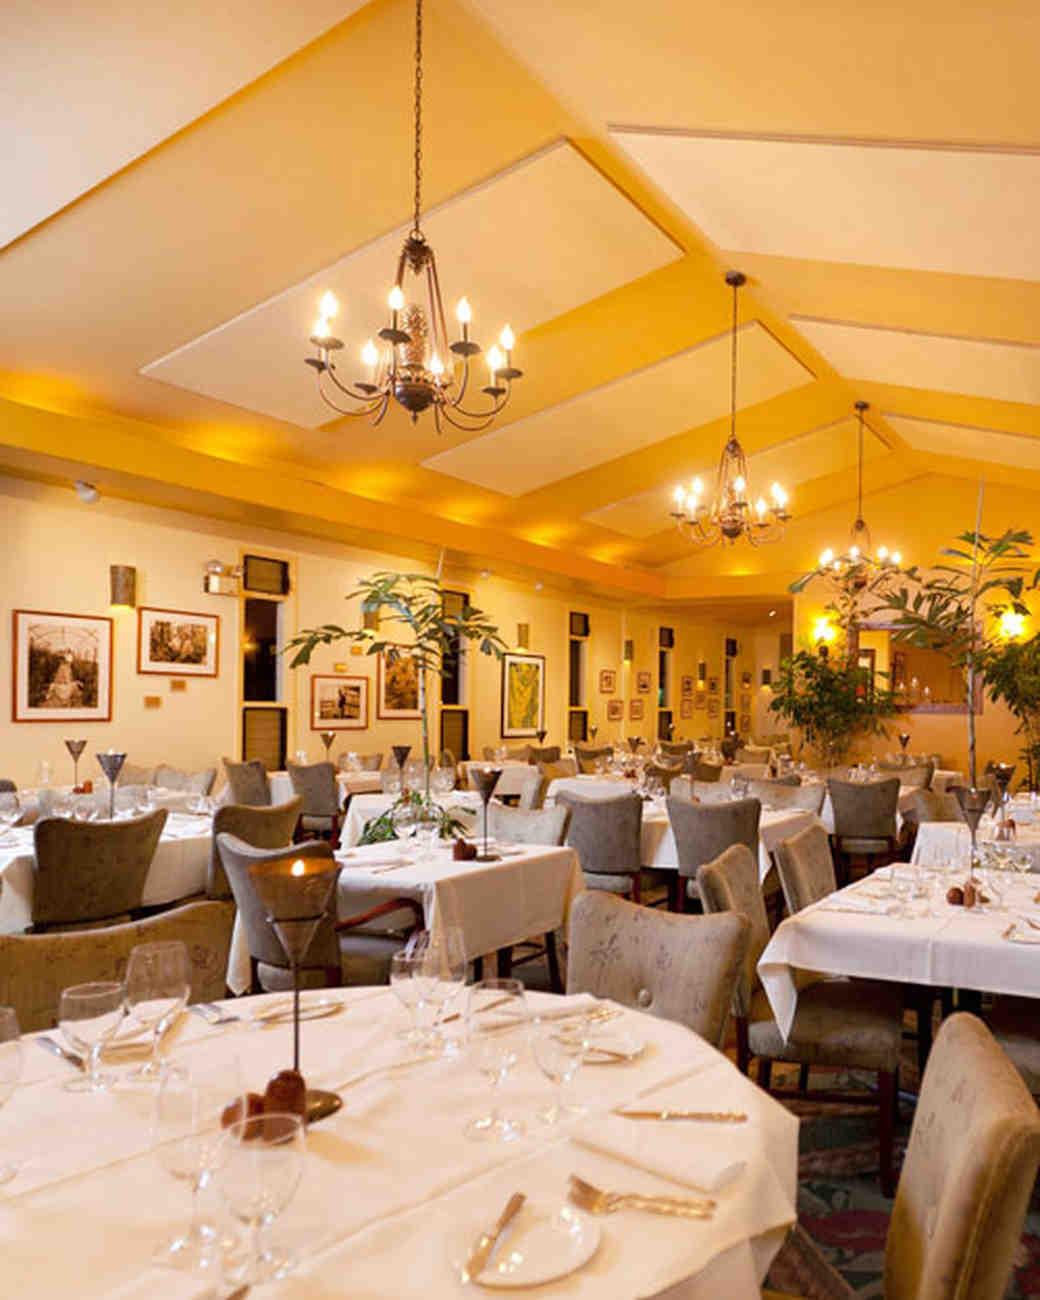 mwd_0111_restaurant_merriman.jpg